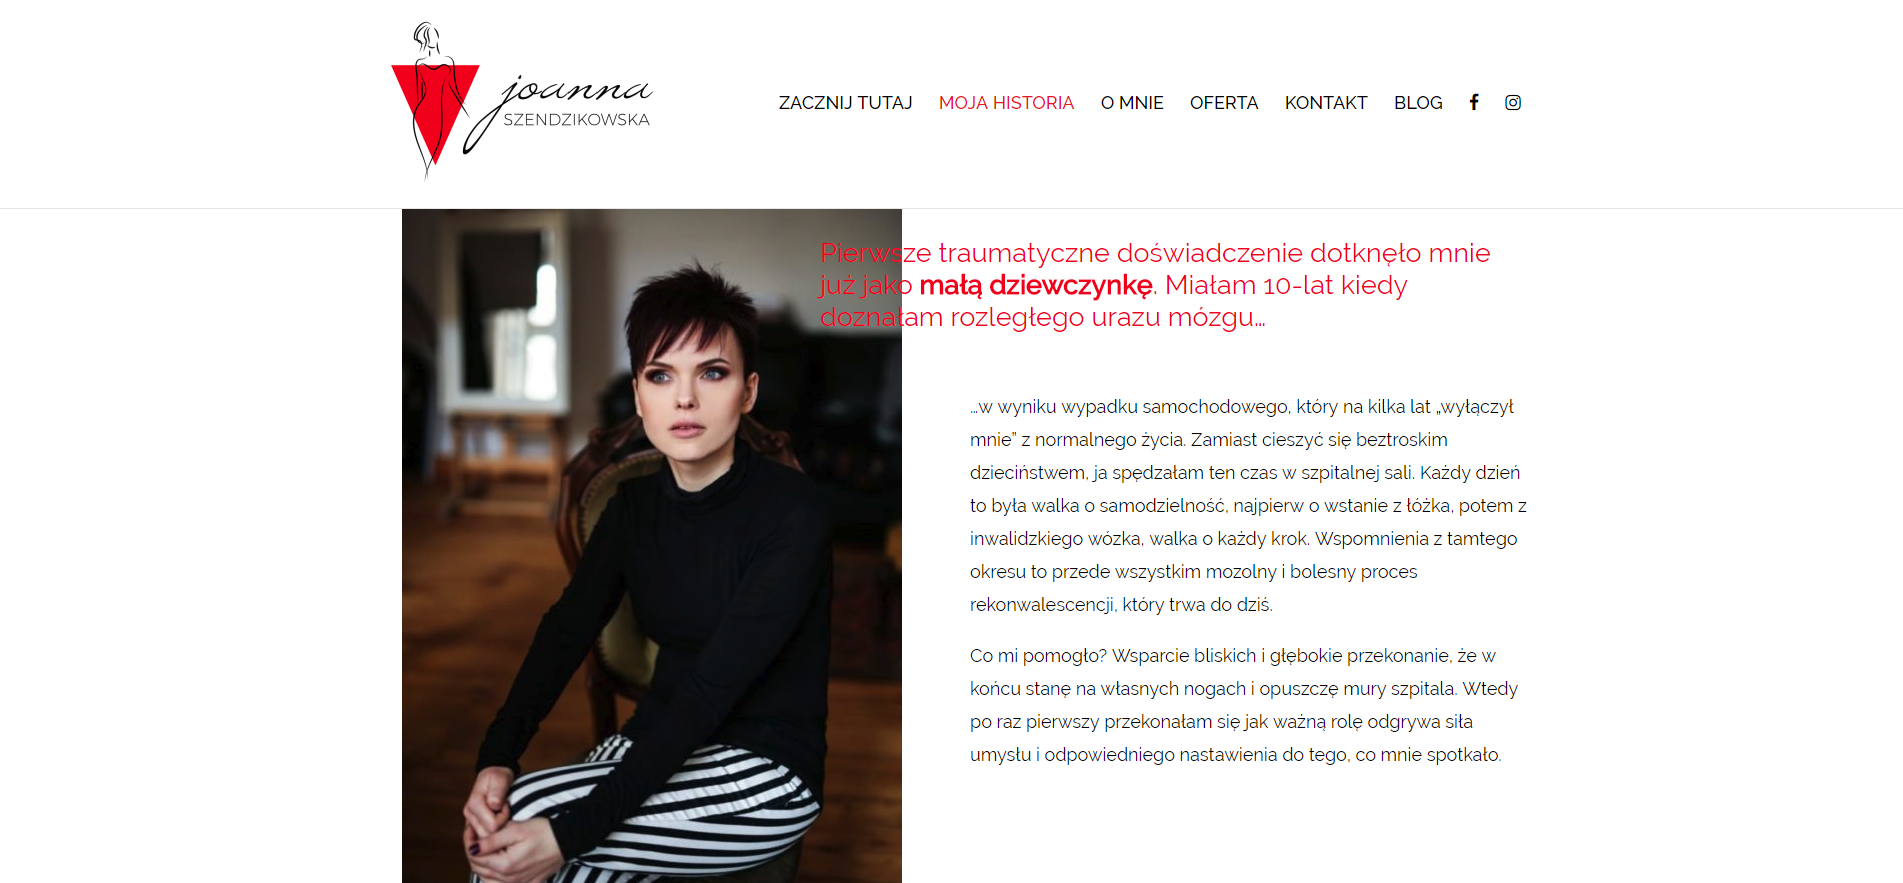 Moja historia Joanna Szendzikowska